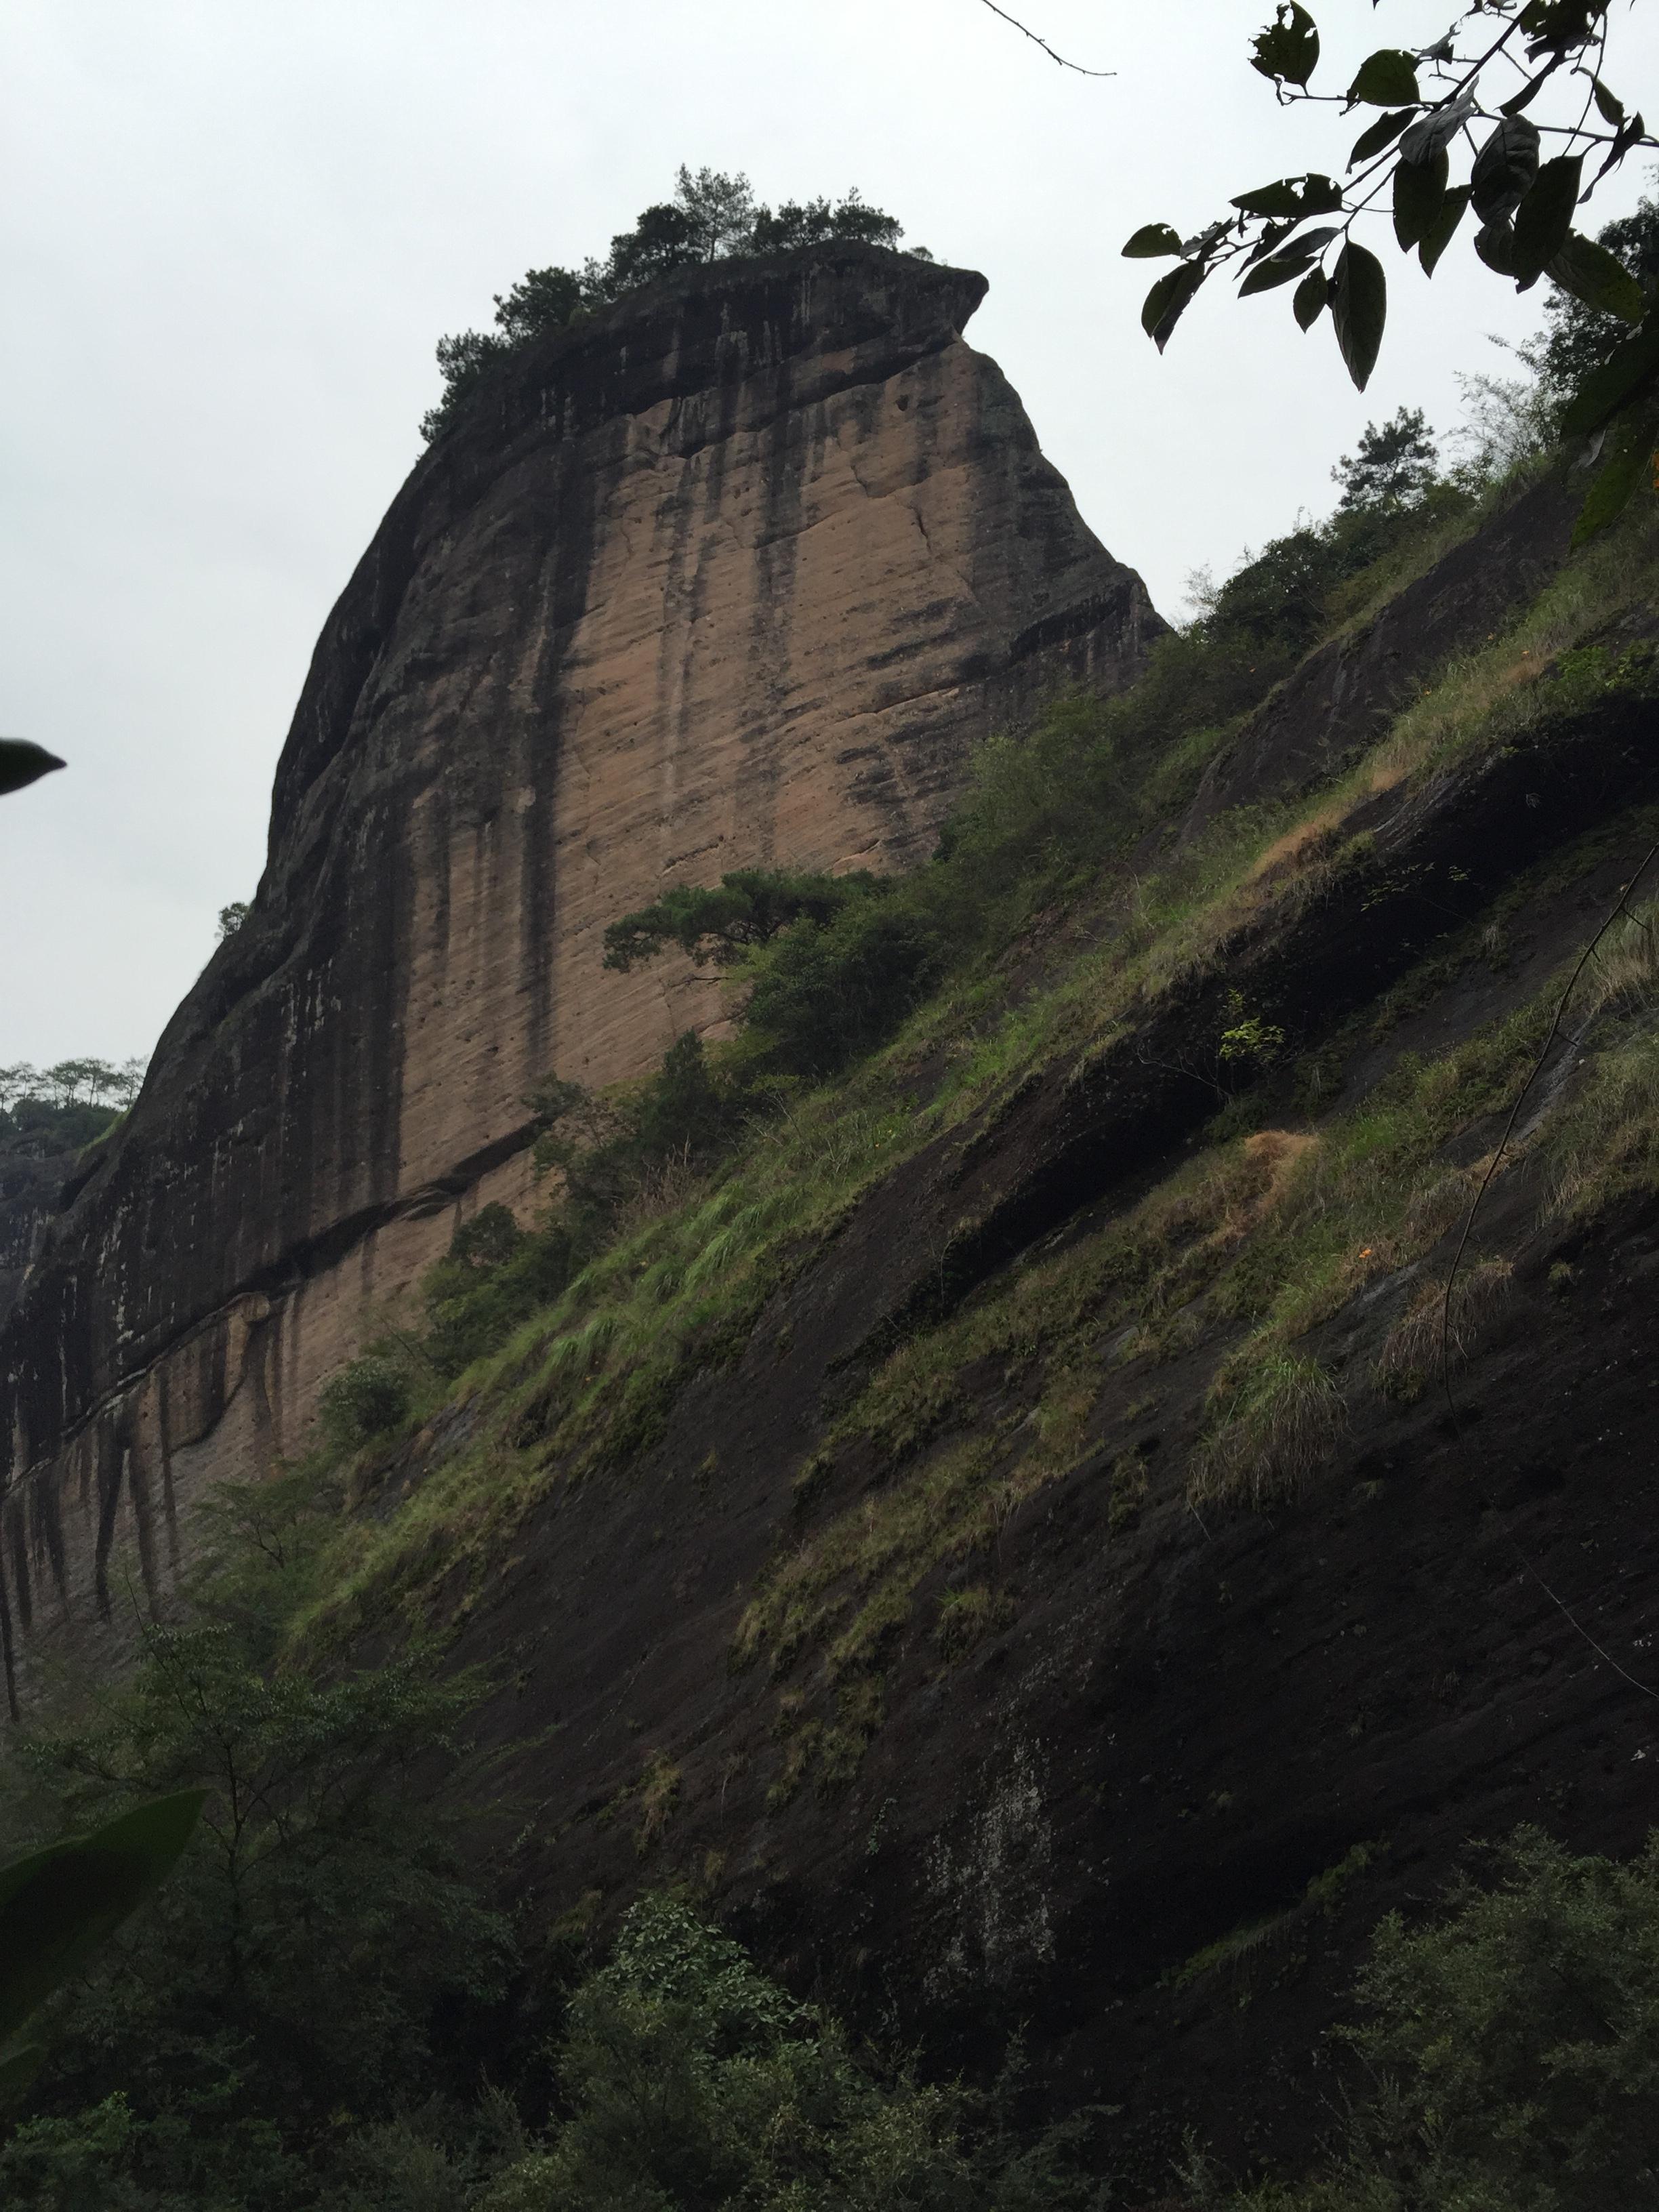 Wuyi Mountain. Photo taken from our Sept 2015 visit.